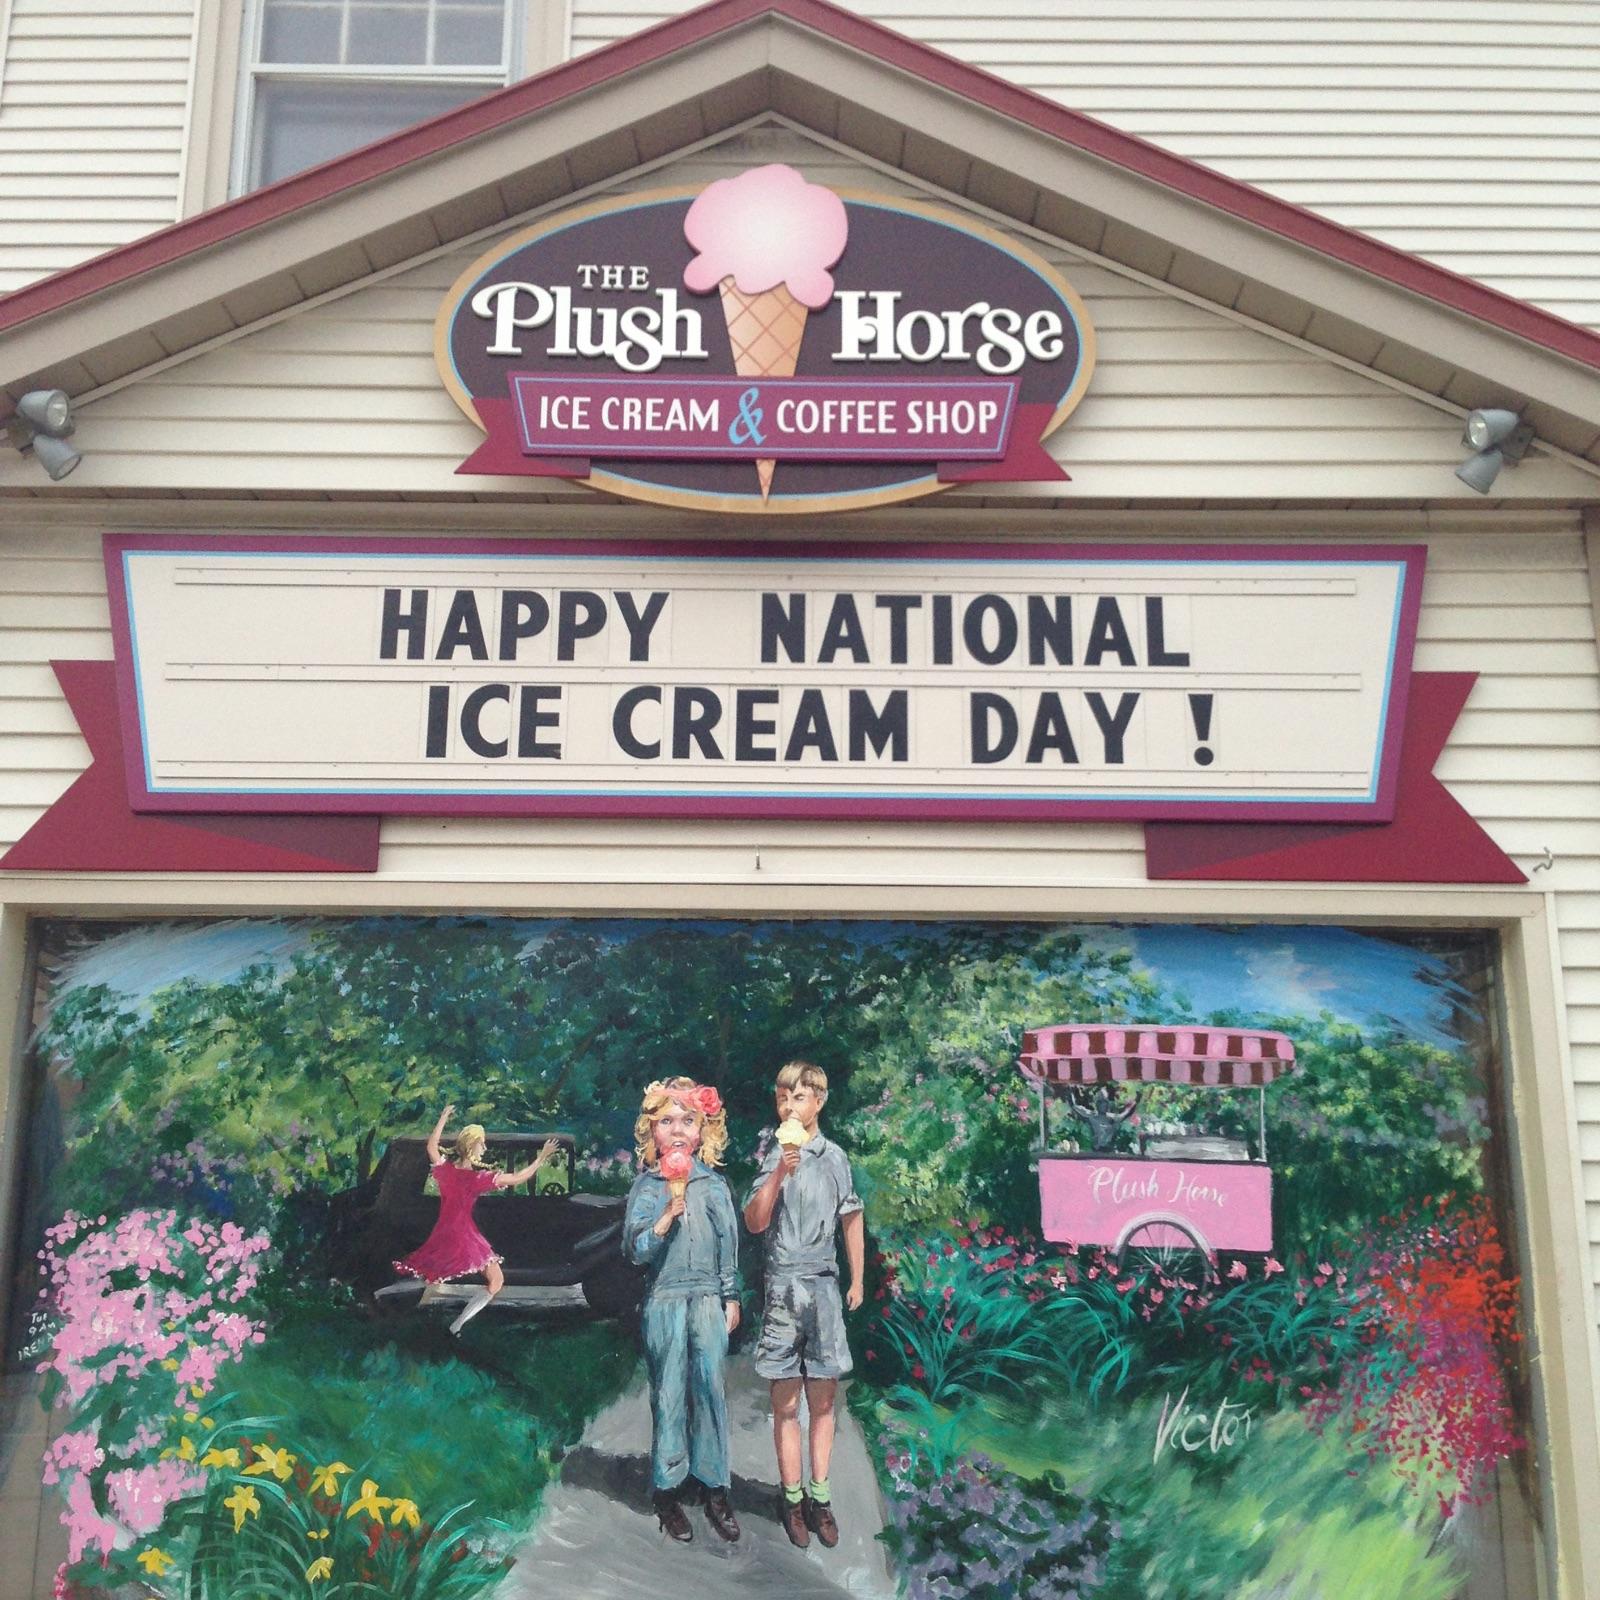 NATIONAL ICE CREAM DAY !